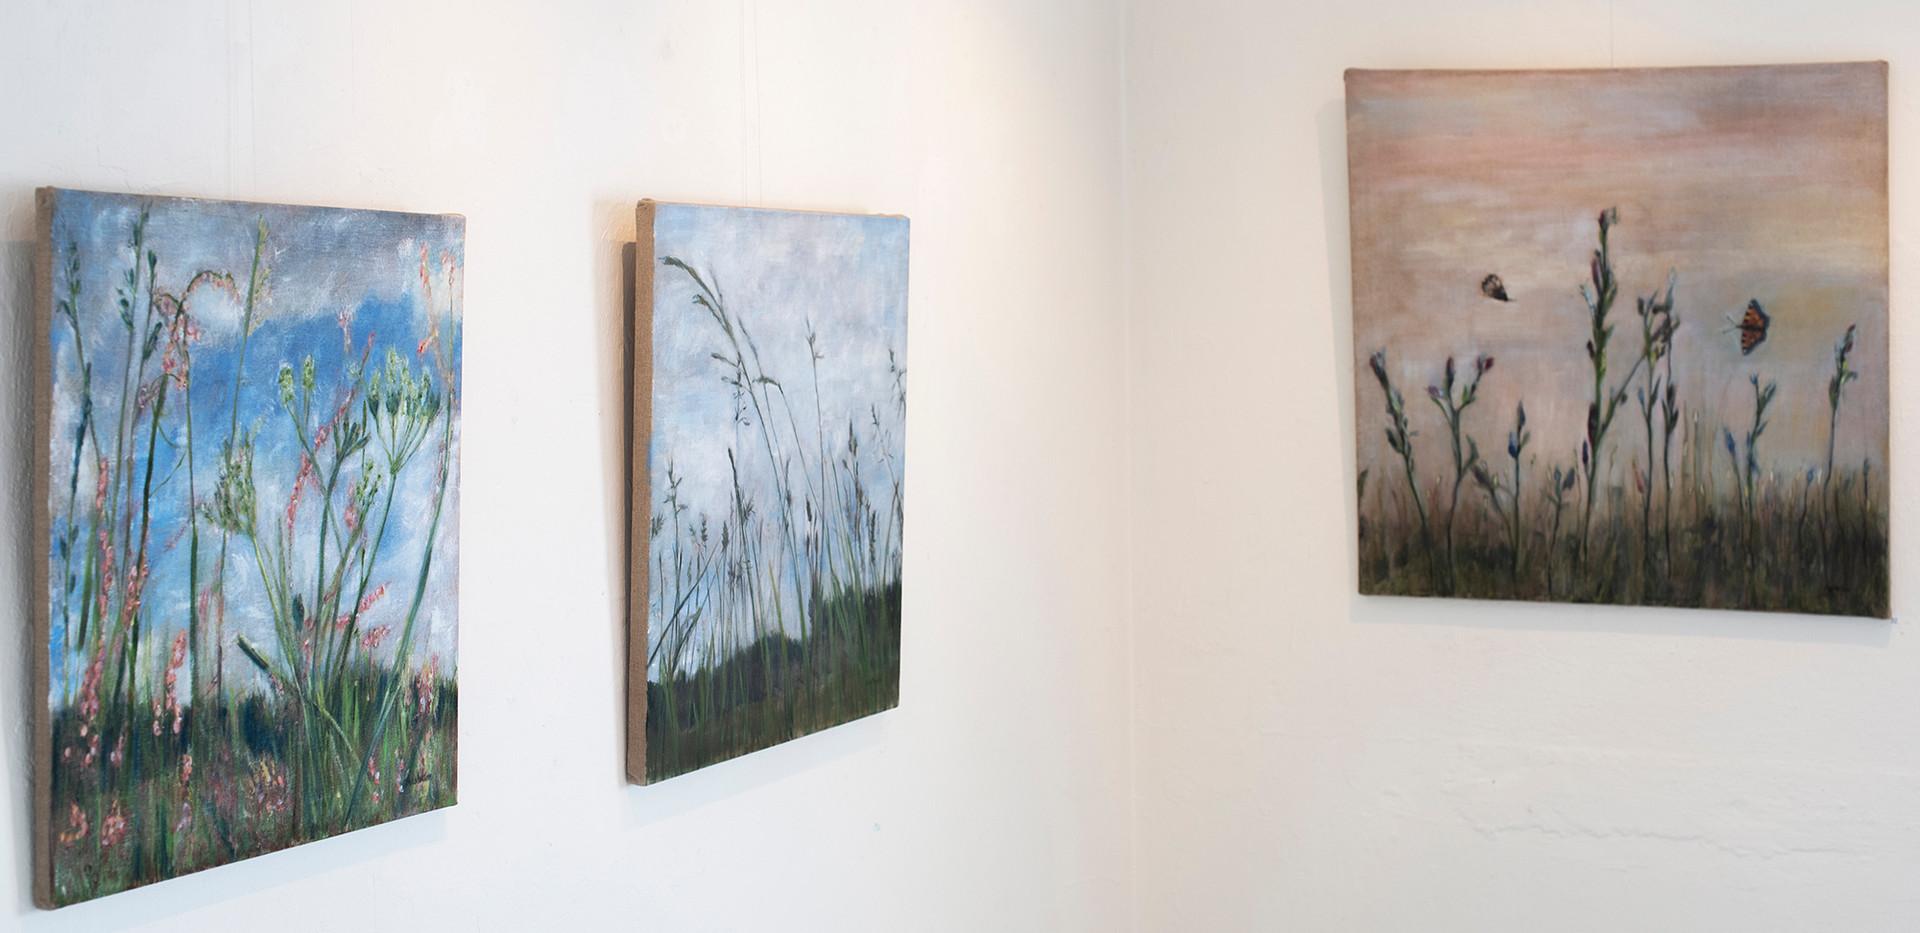 Kirsti Aasheim/ Paintings/ Drøbak Kunstforening